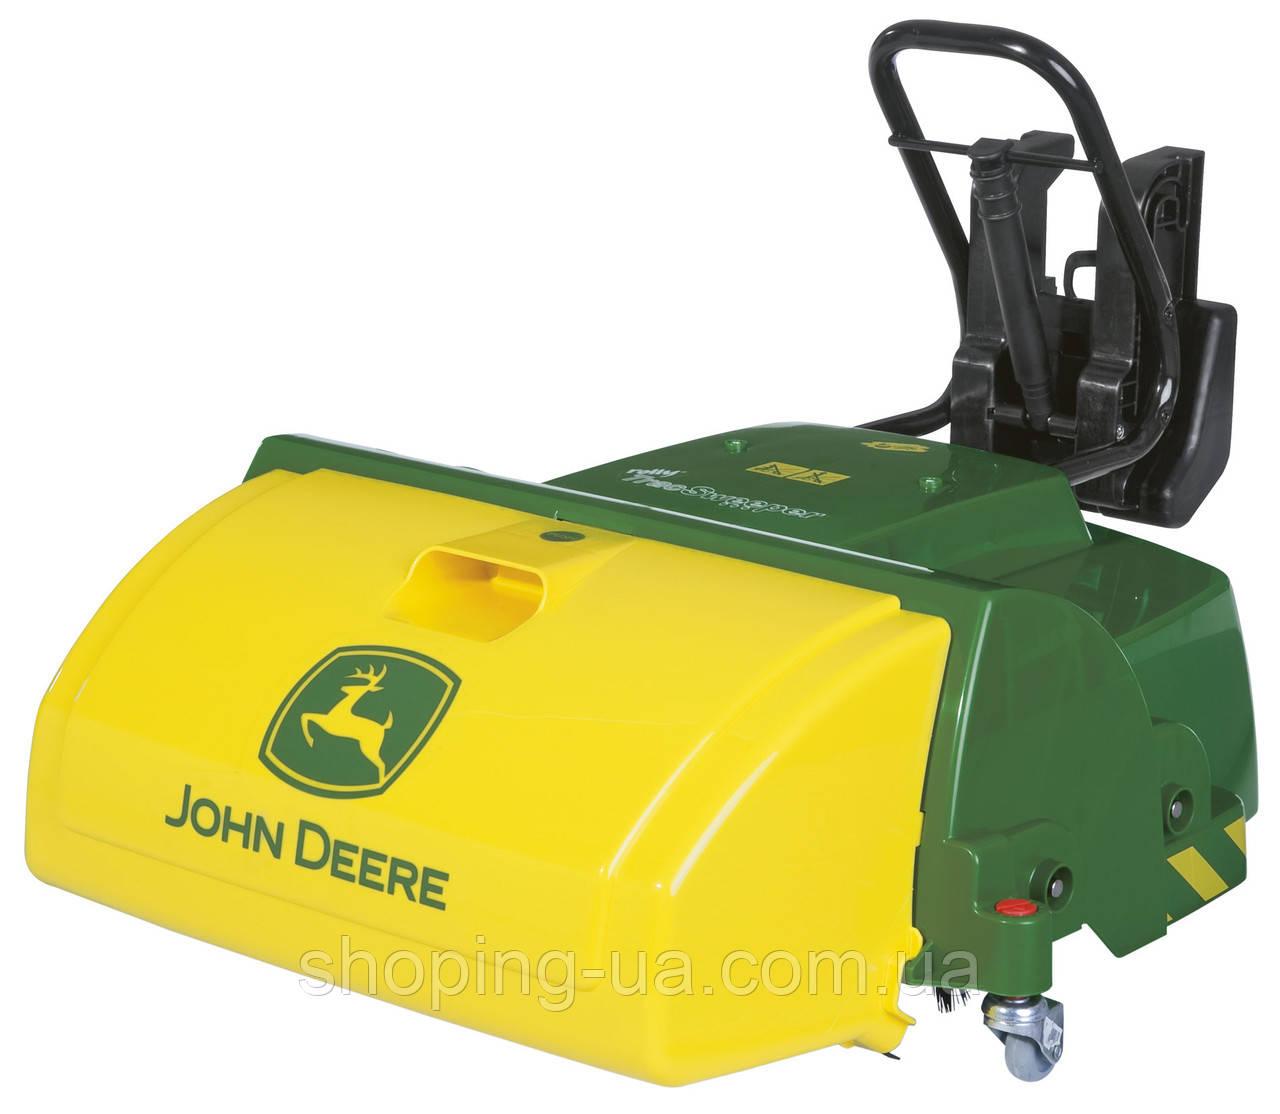 Щетка для уборки к трактору rollyTrac Sweeper John Deere Rolly Toys 409716